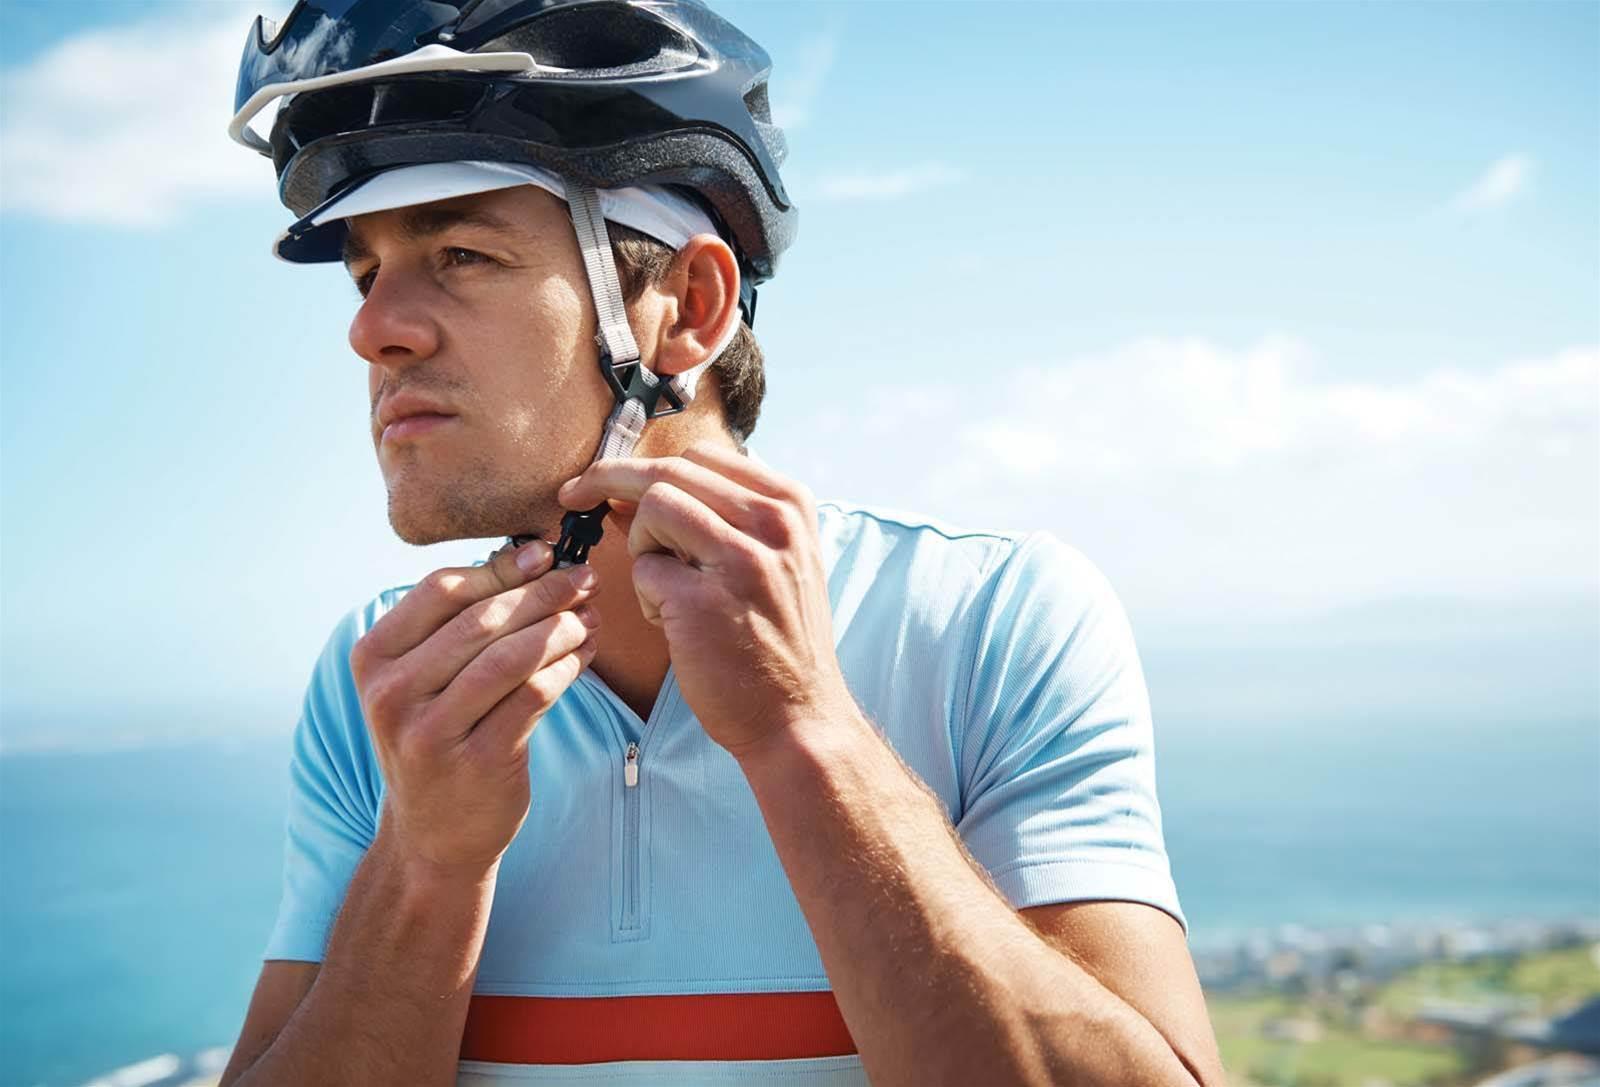 Ride Hacks: How to fit your helmet